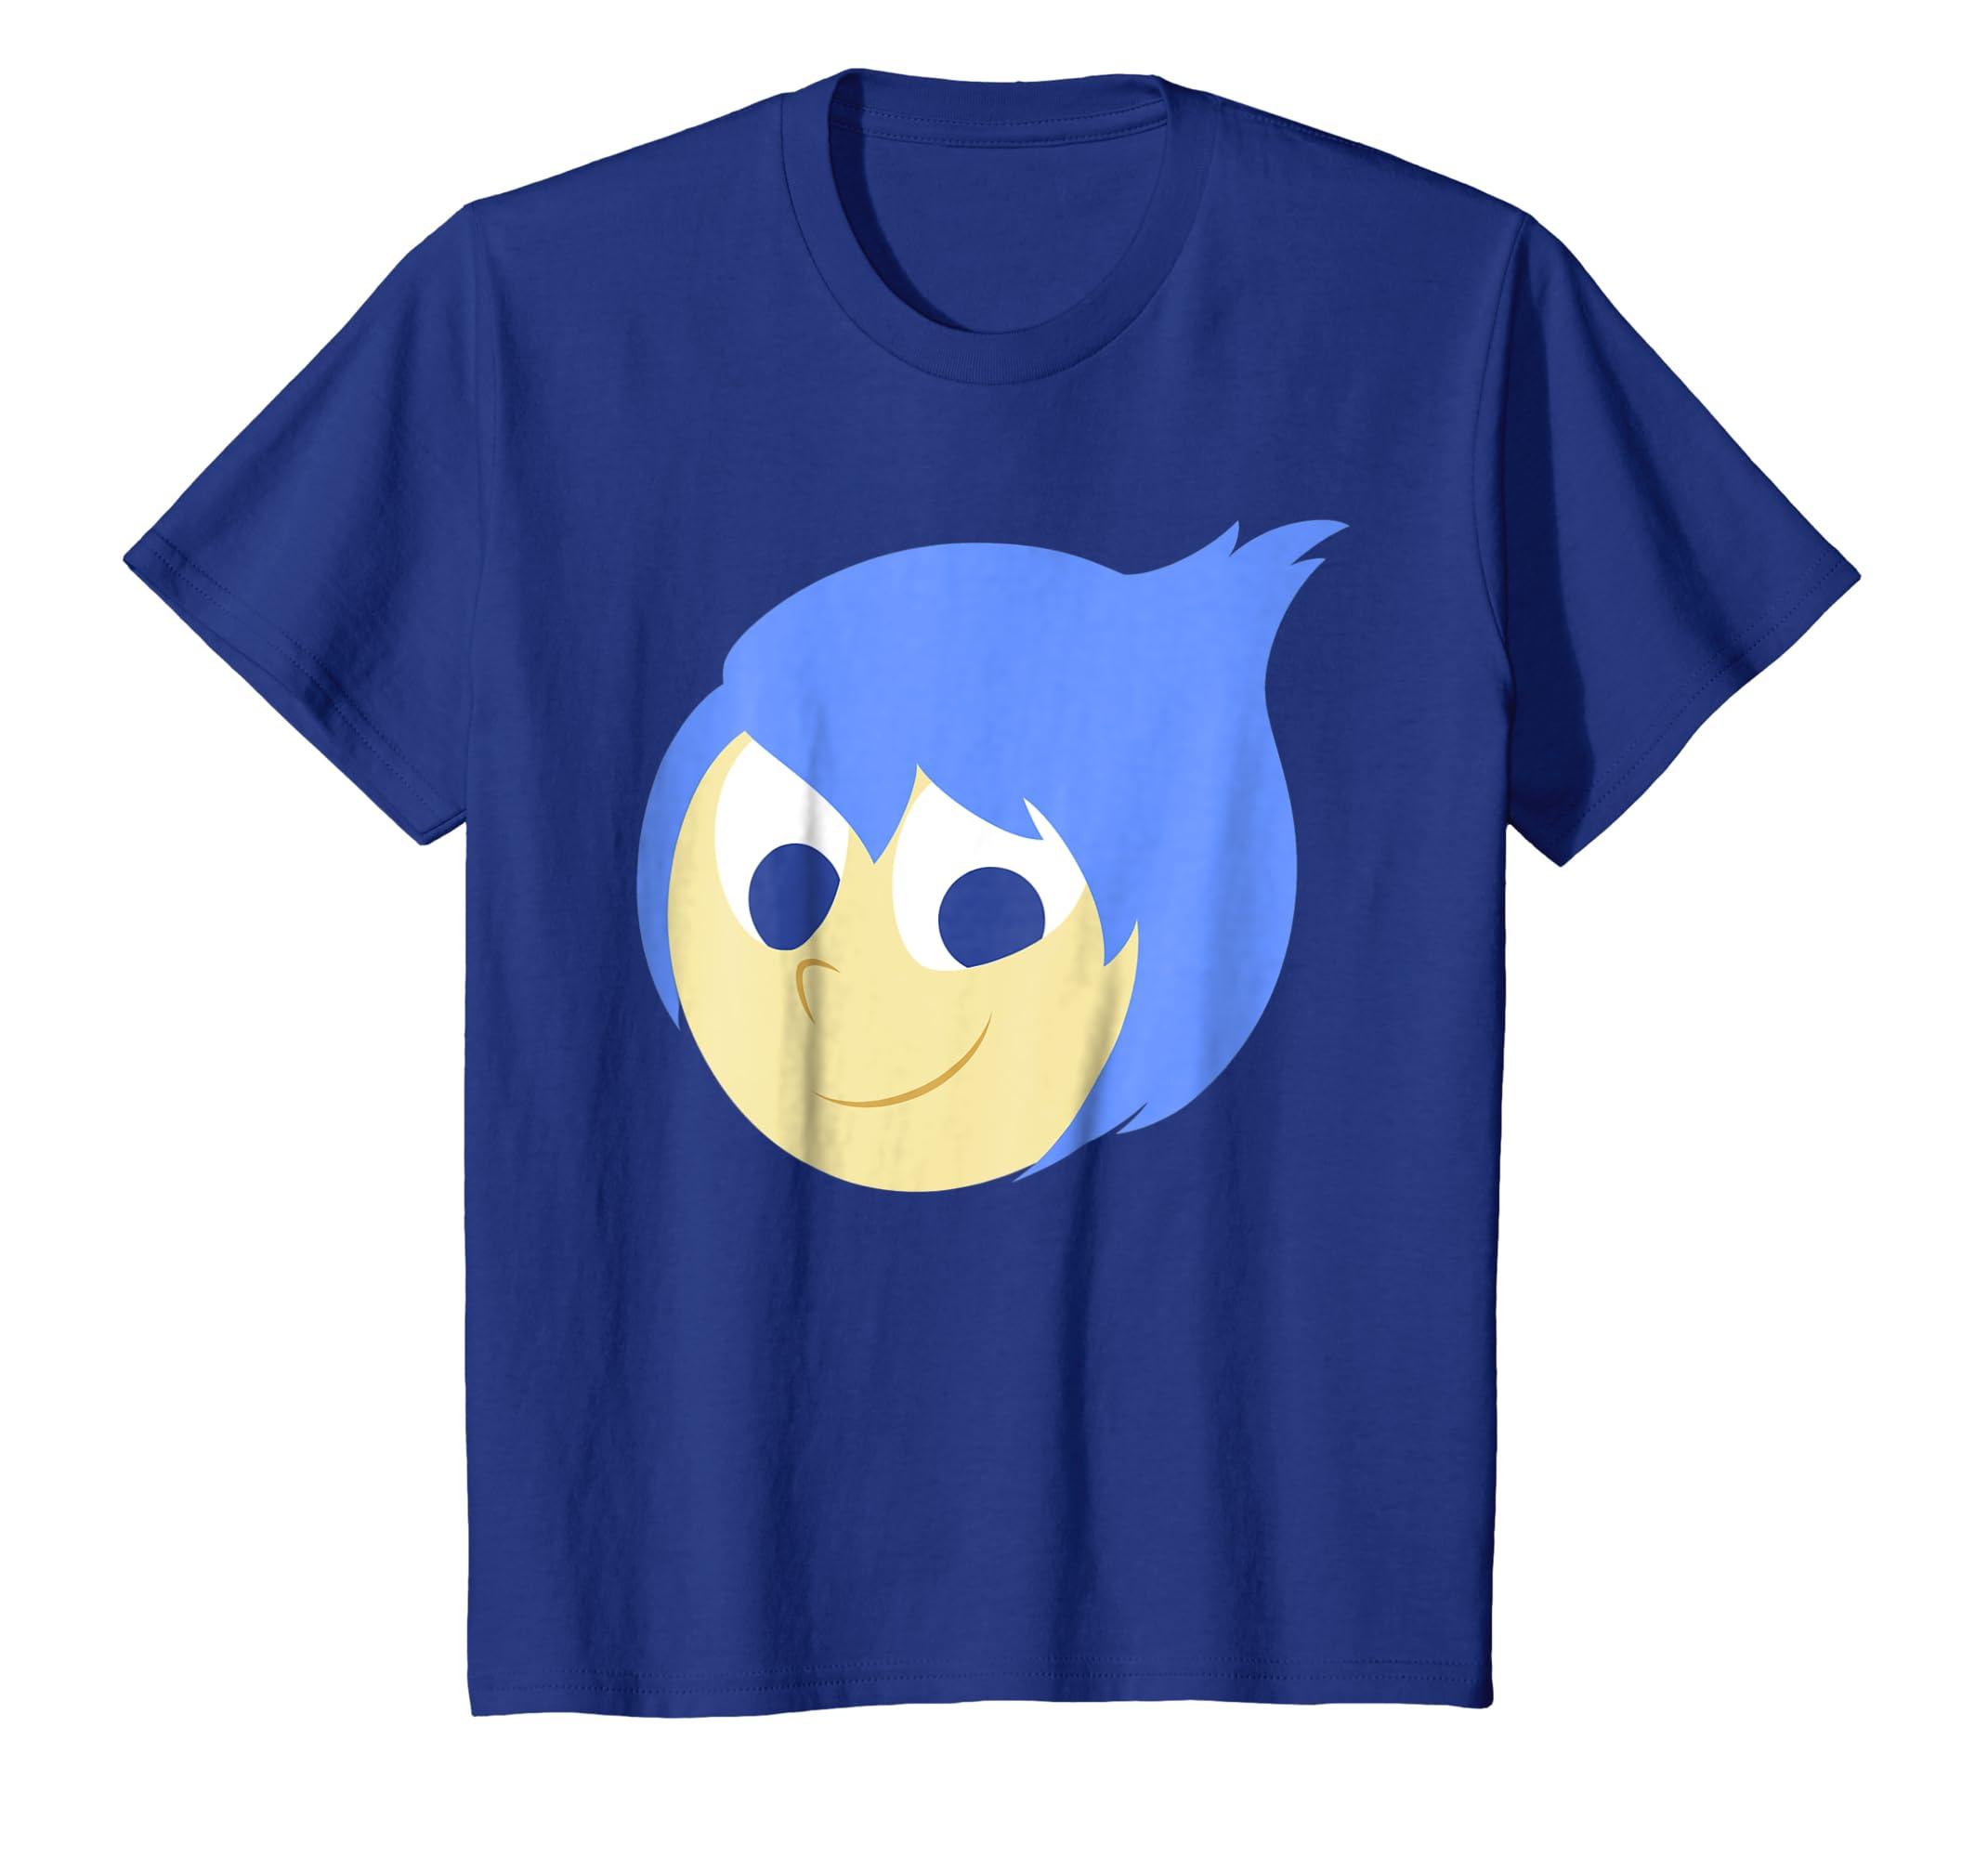 Pixar Inside Out Joy Face Halloween Graphic T Shirt-Teechatpro